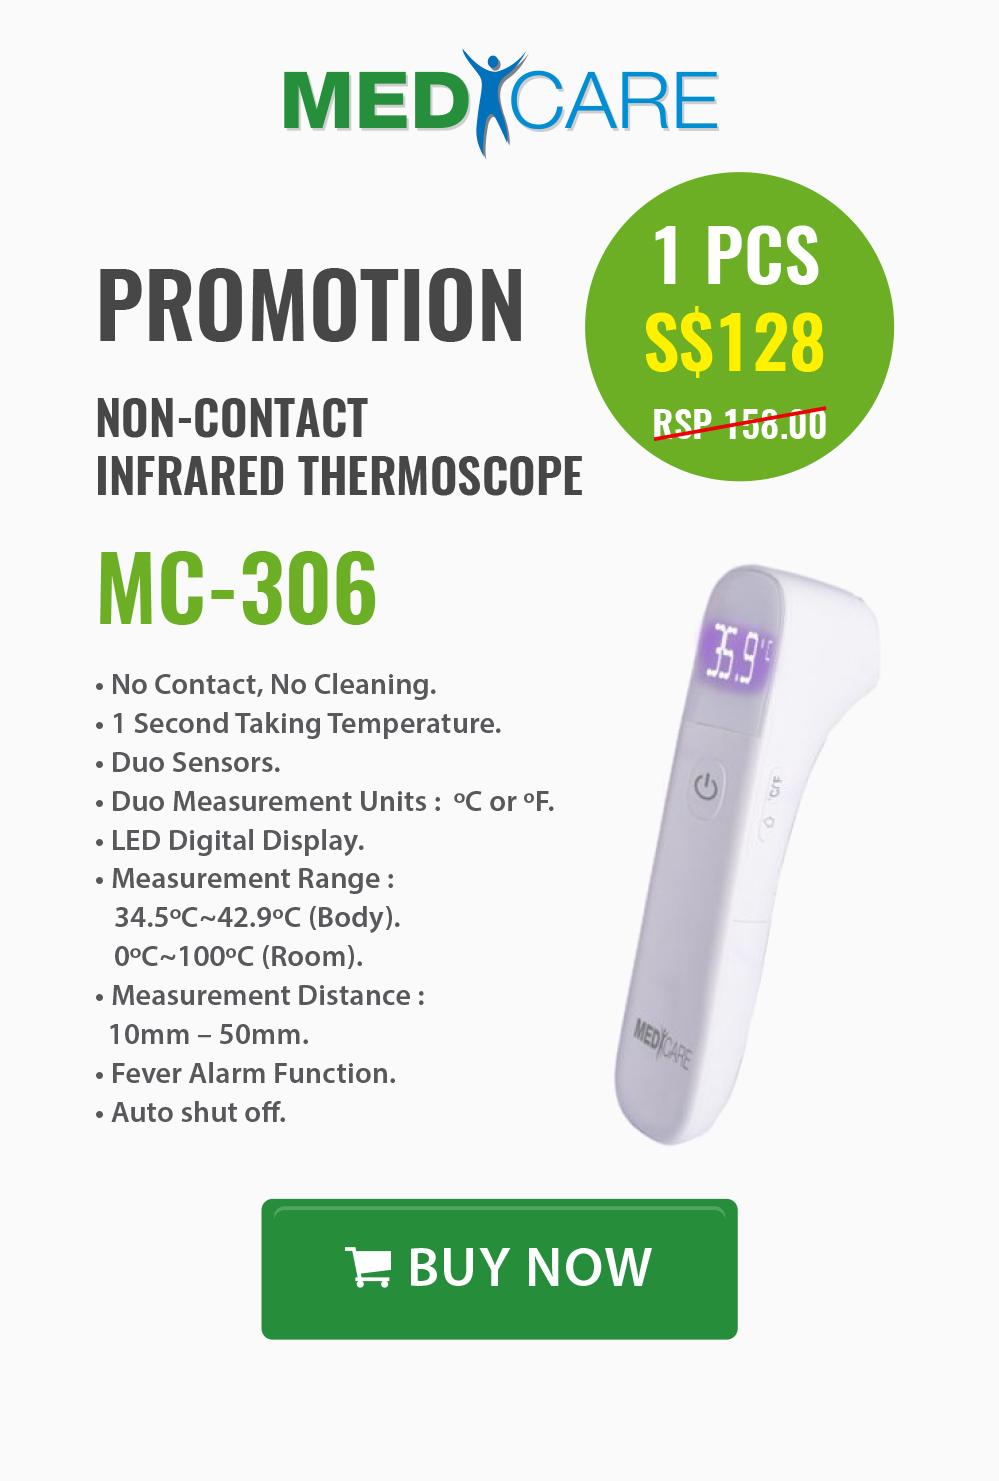 MC-306